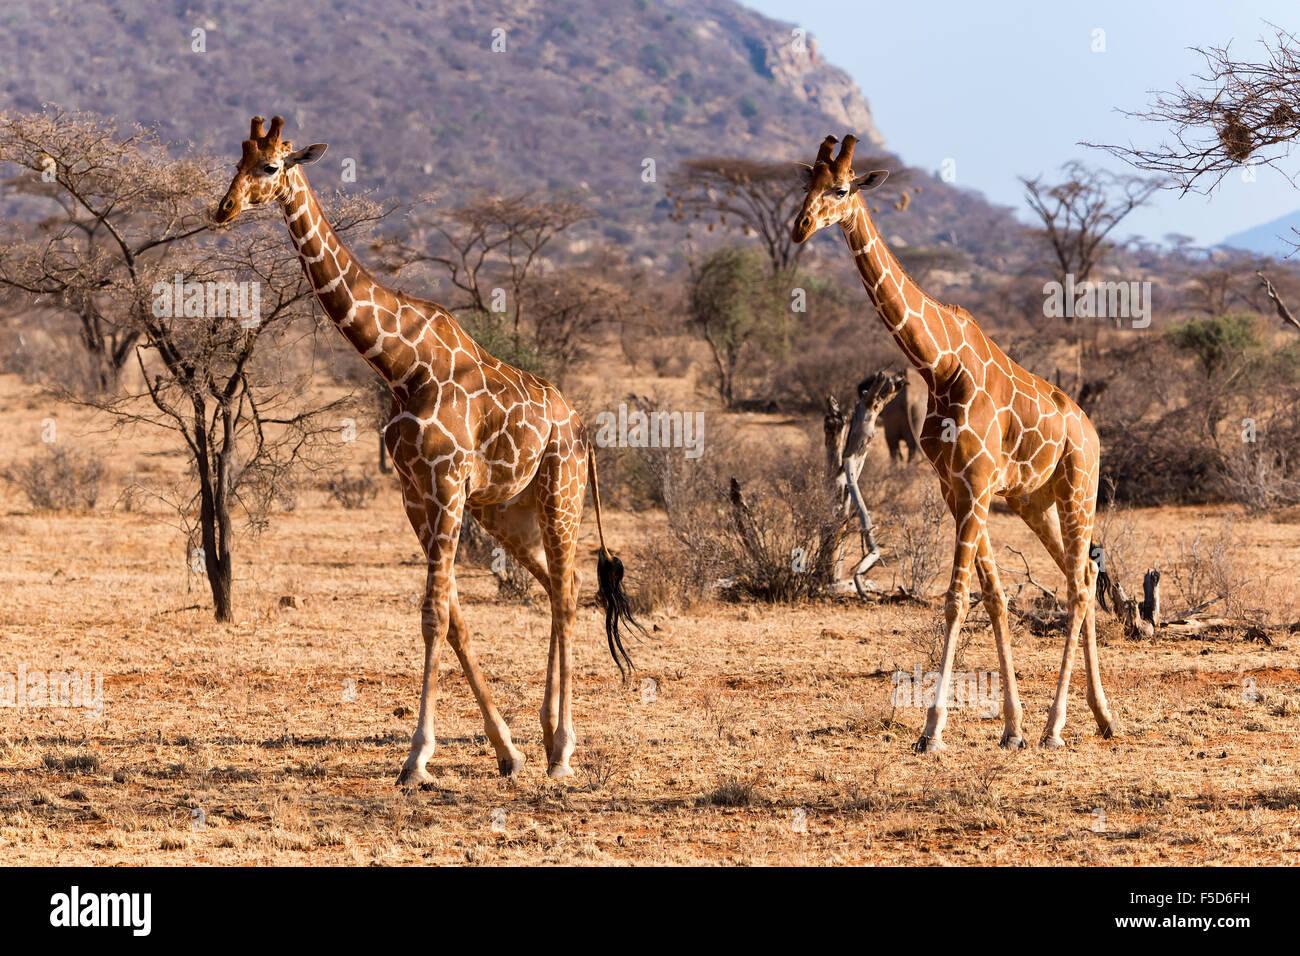 Reticulated giraffes or Somali giraffes (Giraffa reticulata camelopardalis) running, Samburu National Reserve, Kenya Stock Photo